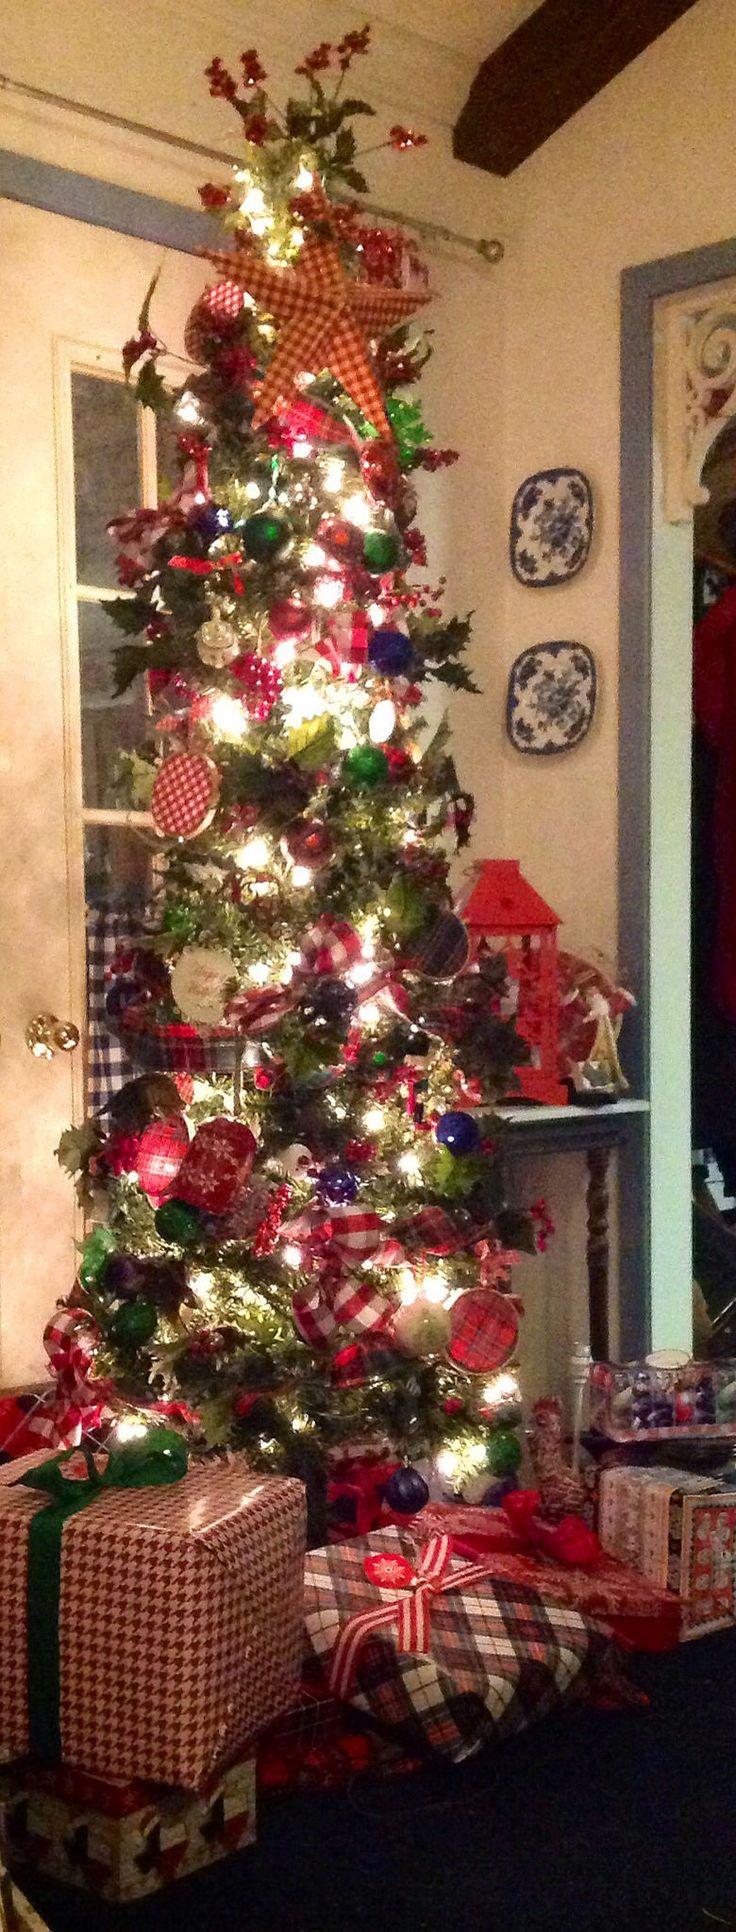 httpsflickrpNWFucL image 1117 best Christmas tree